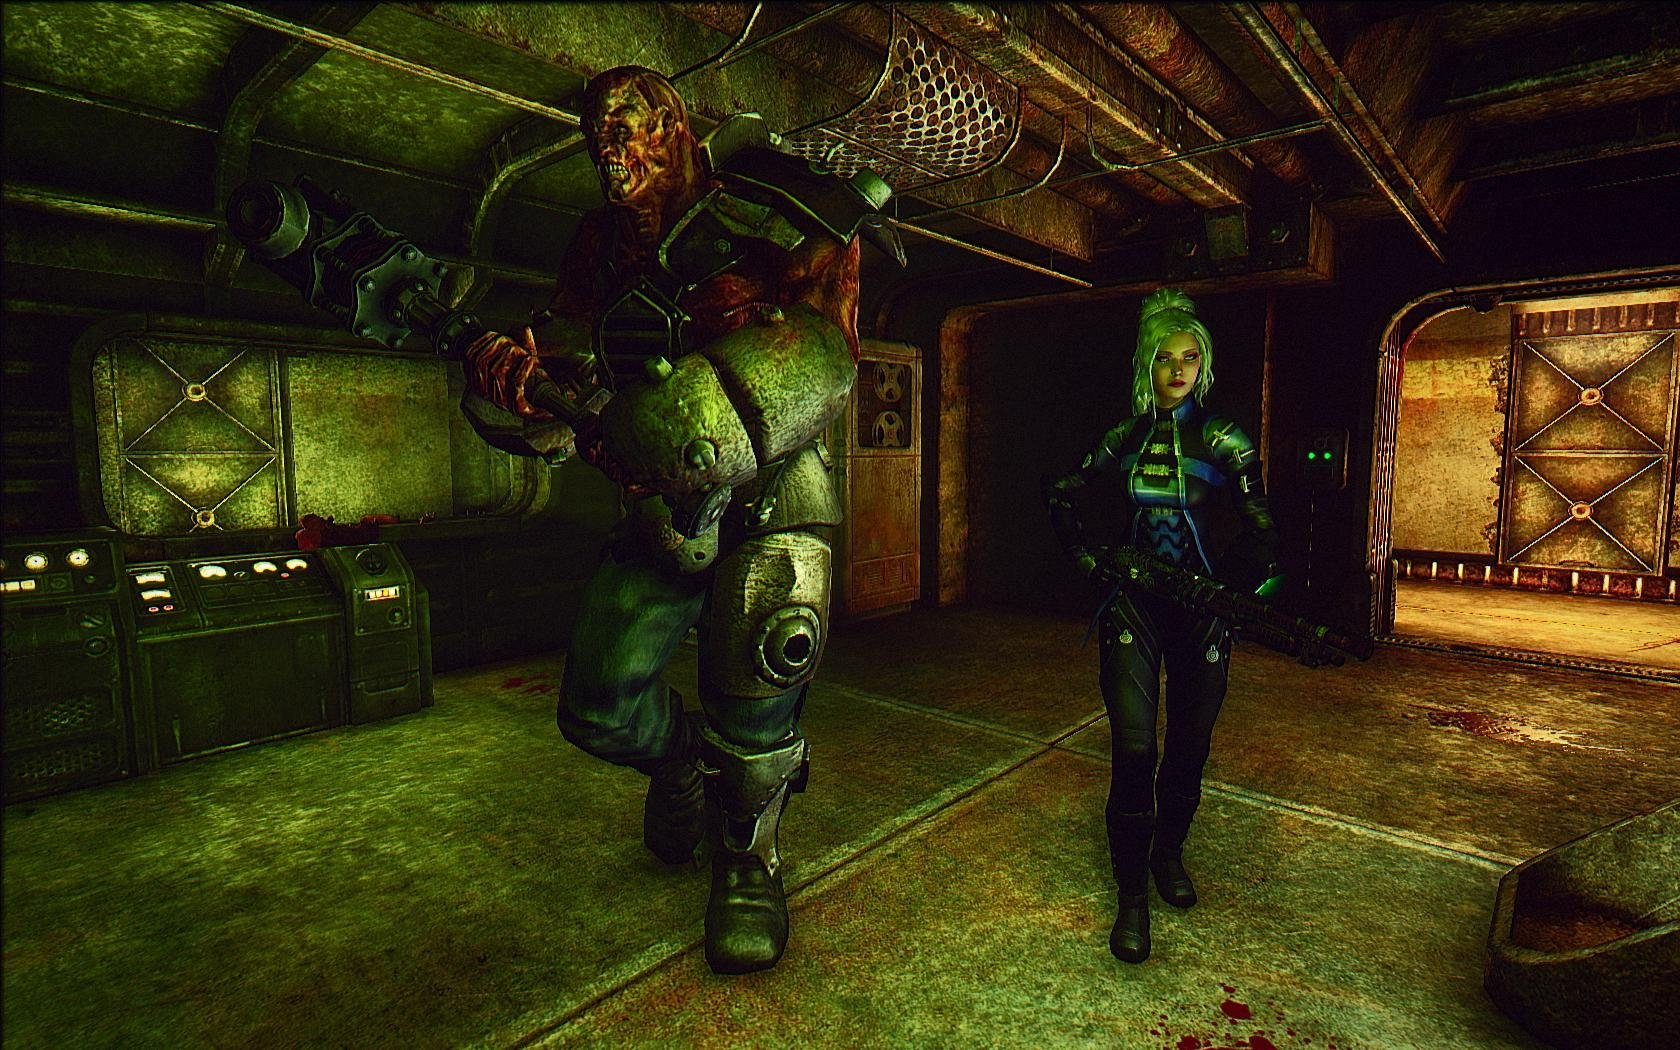 Fallout3 2019-05-12 22-28-24-22